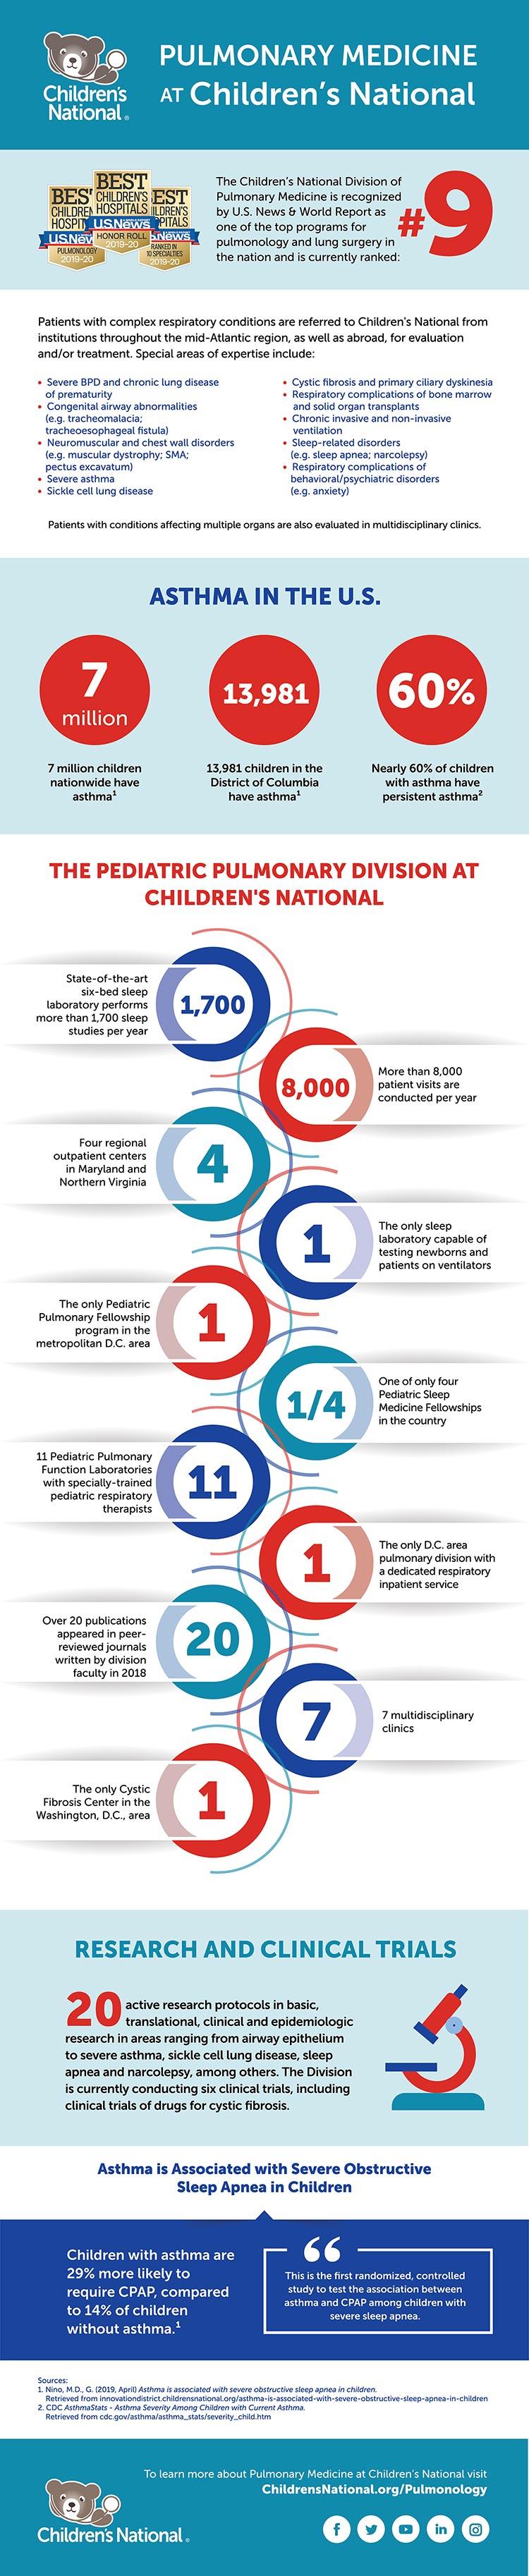 Pulmonary Medicine at Children's National